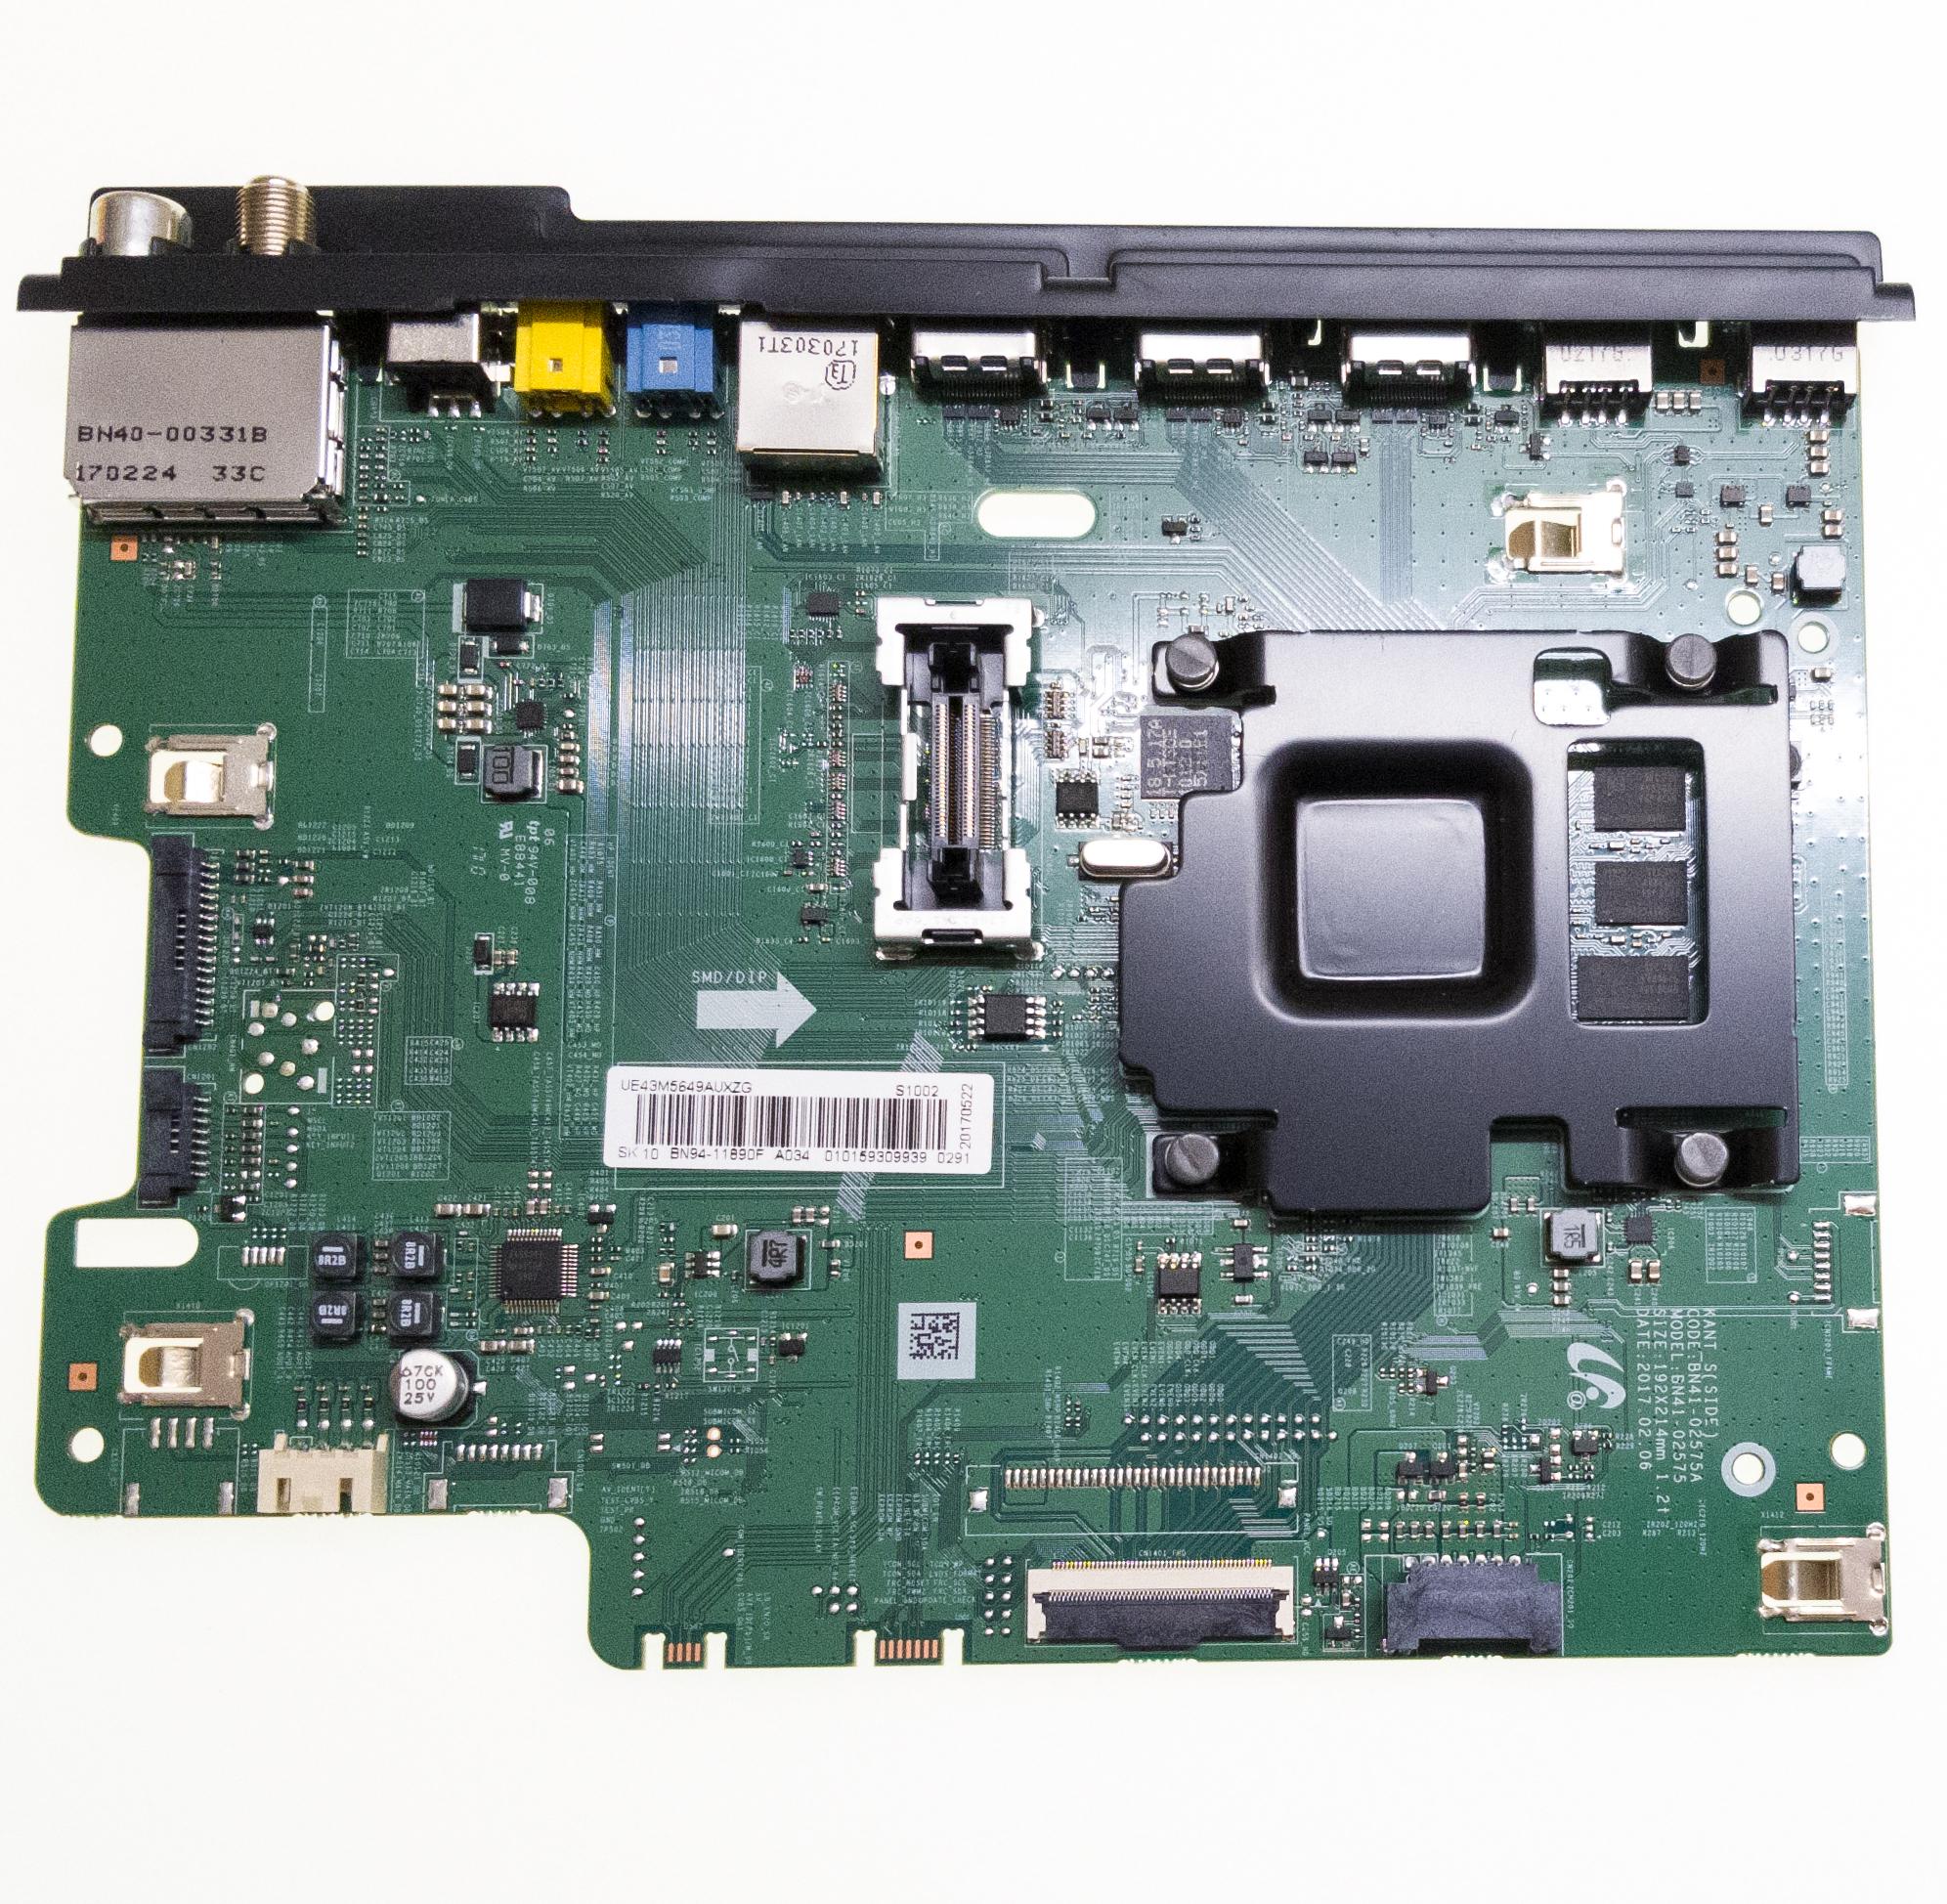 /tmp/con-5ded2538abc10/51540_Product.jpg